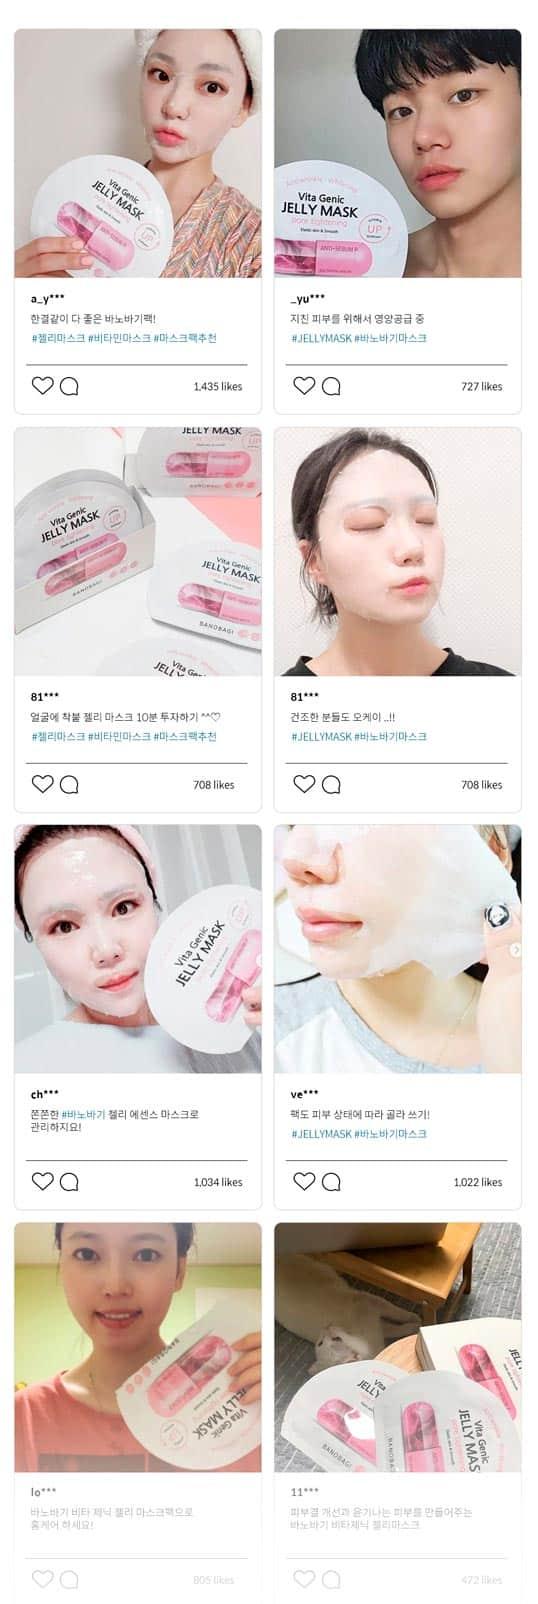 Banobagi Vita Genic Jelly Mask Pore Tightening reviews